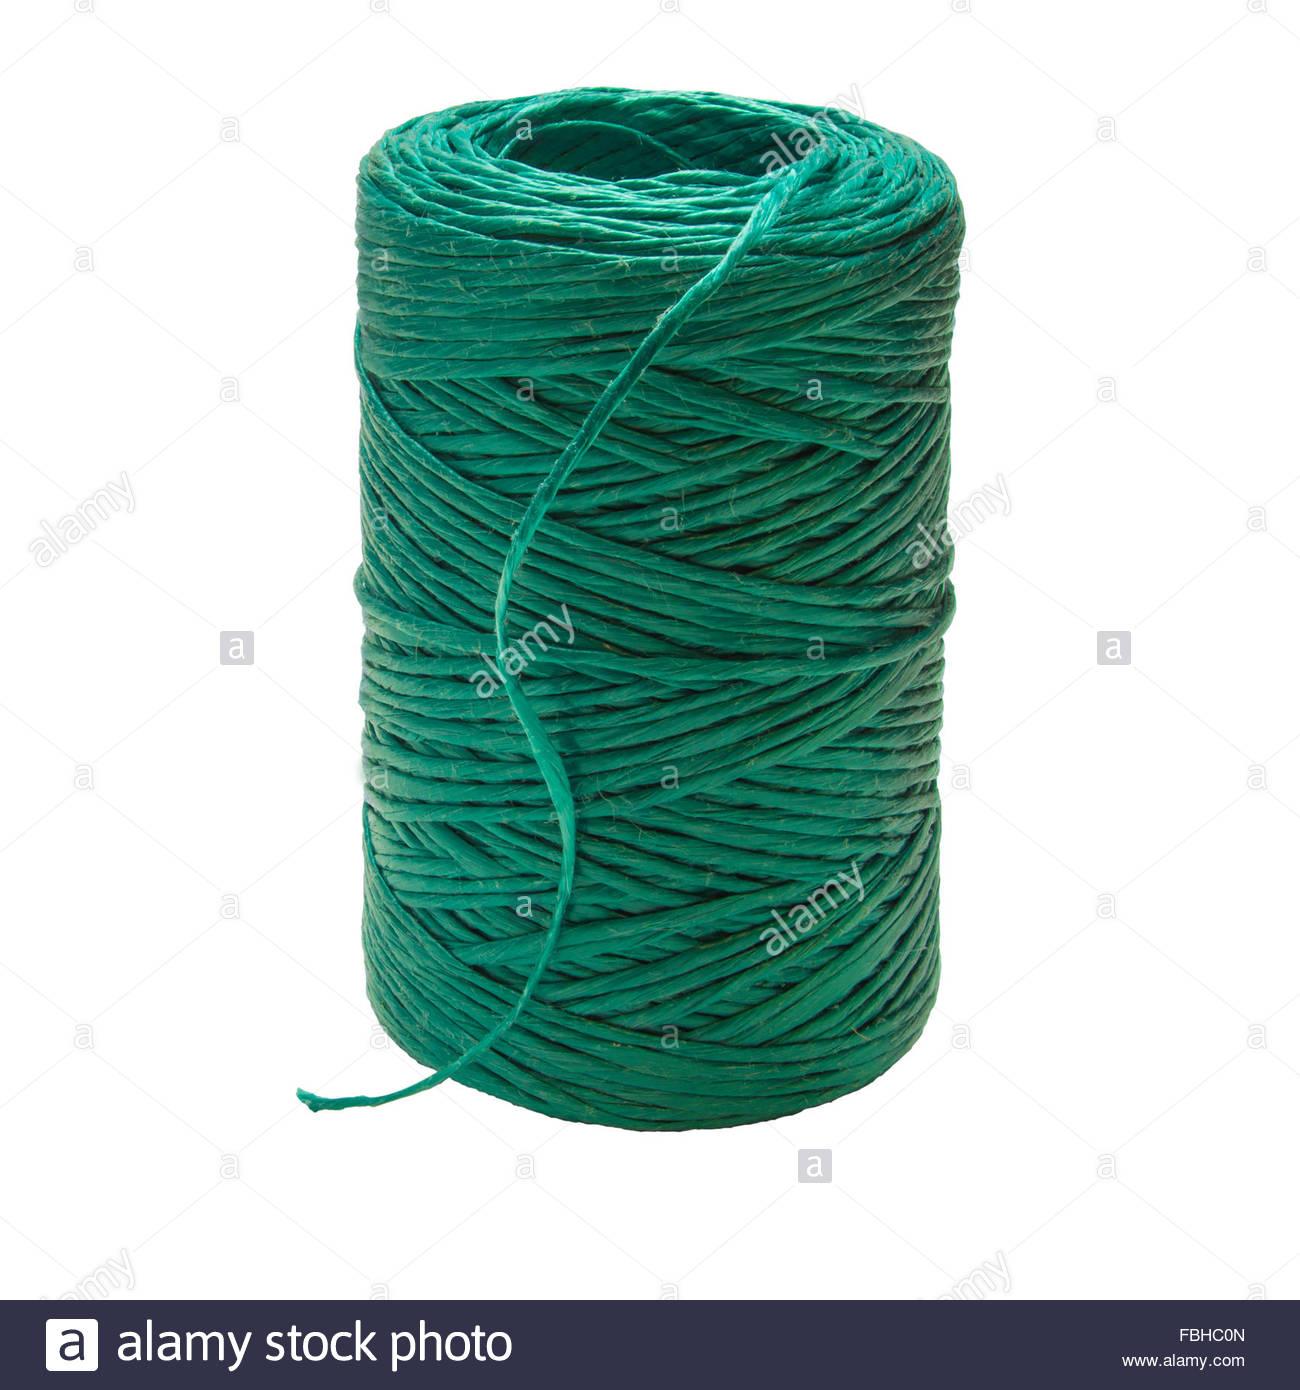 Etonnant Green Polypropylene Garden String Twine Isolated On White   Stock Image